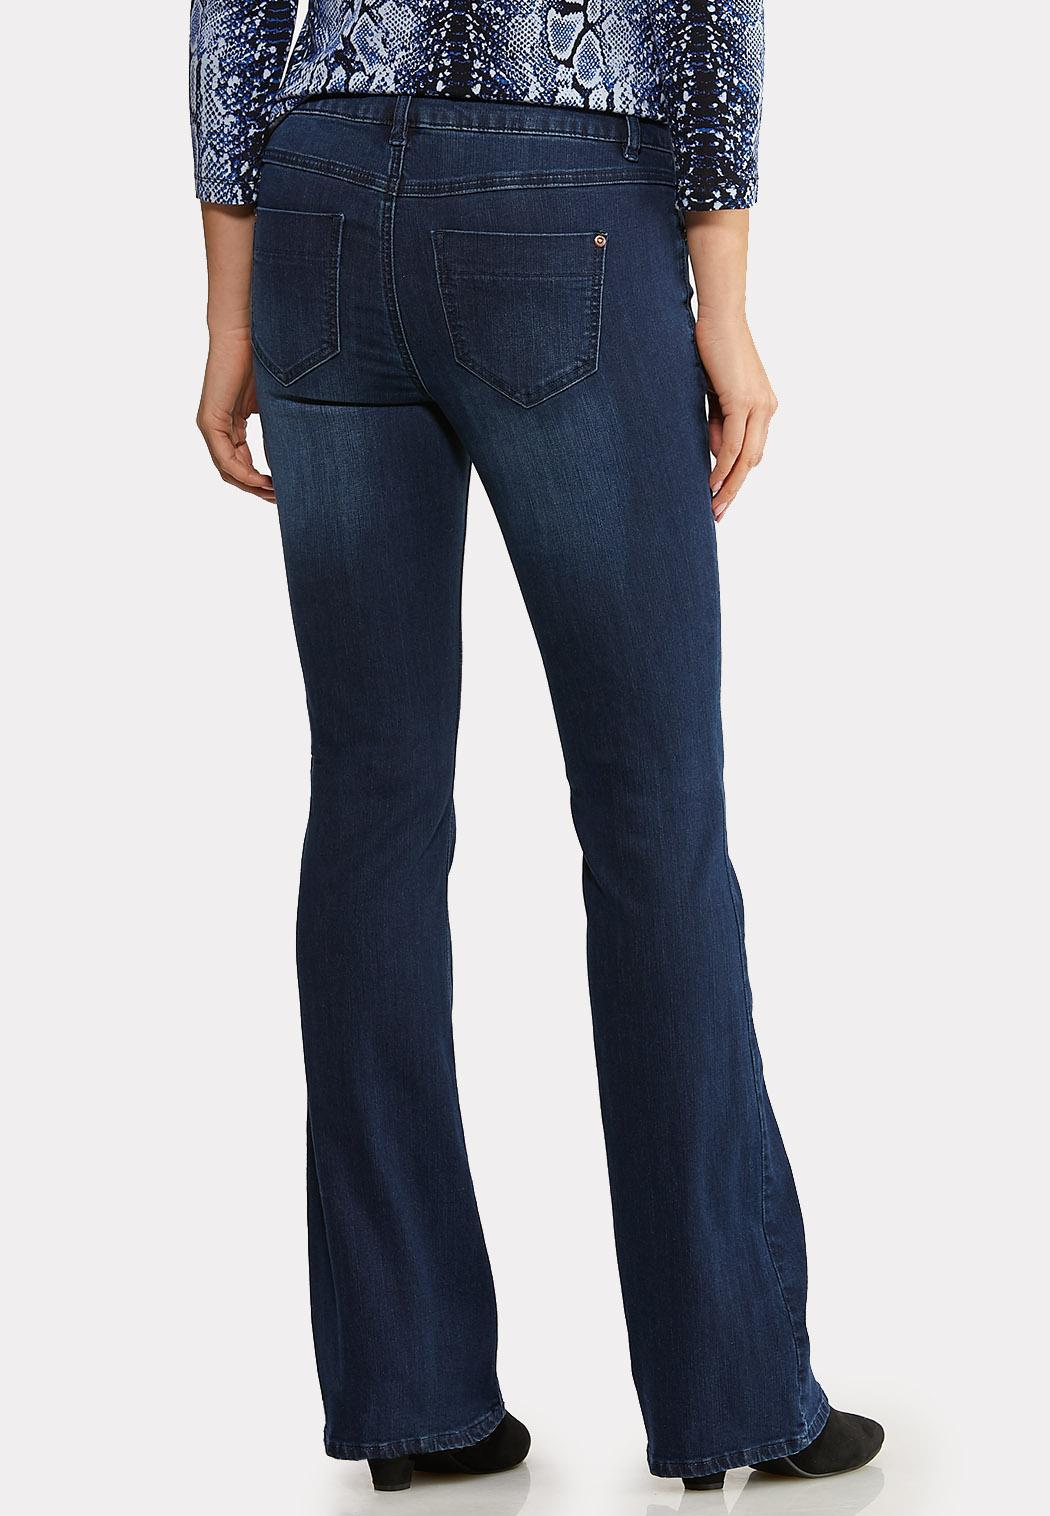 Dark Wash Flare Jeans (Item #44096503)